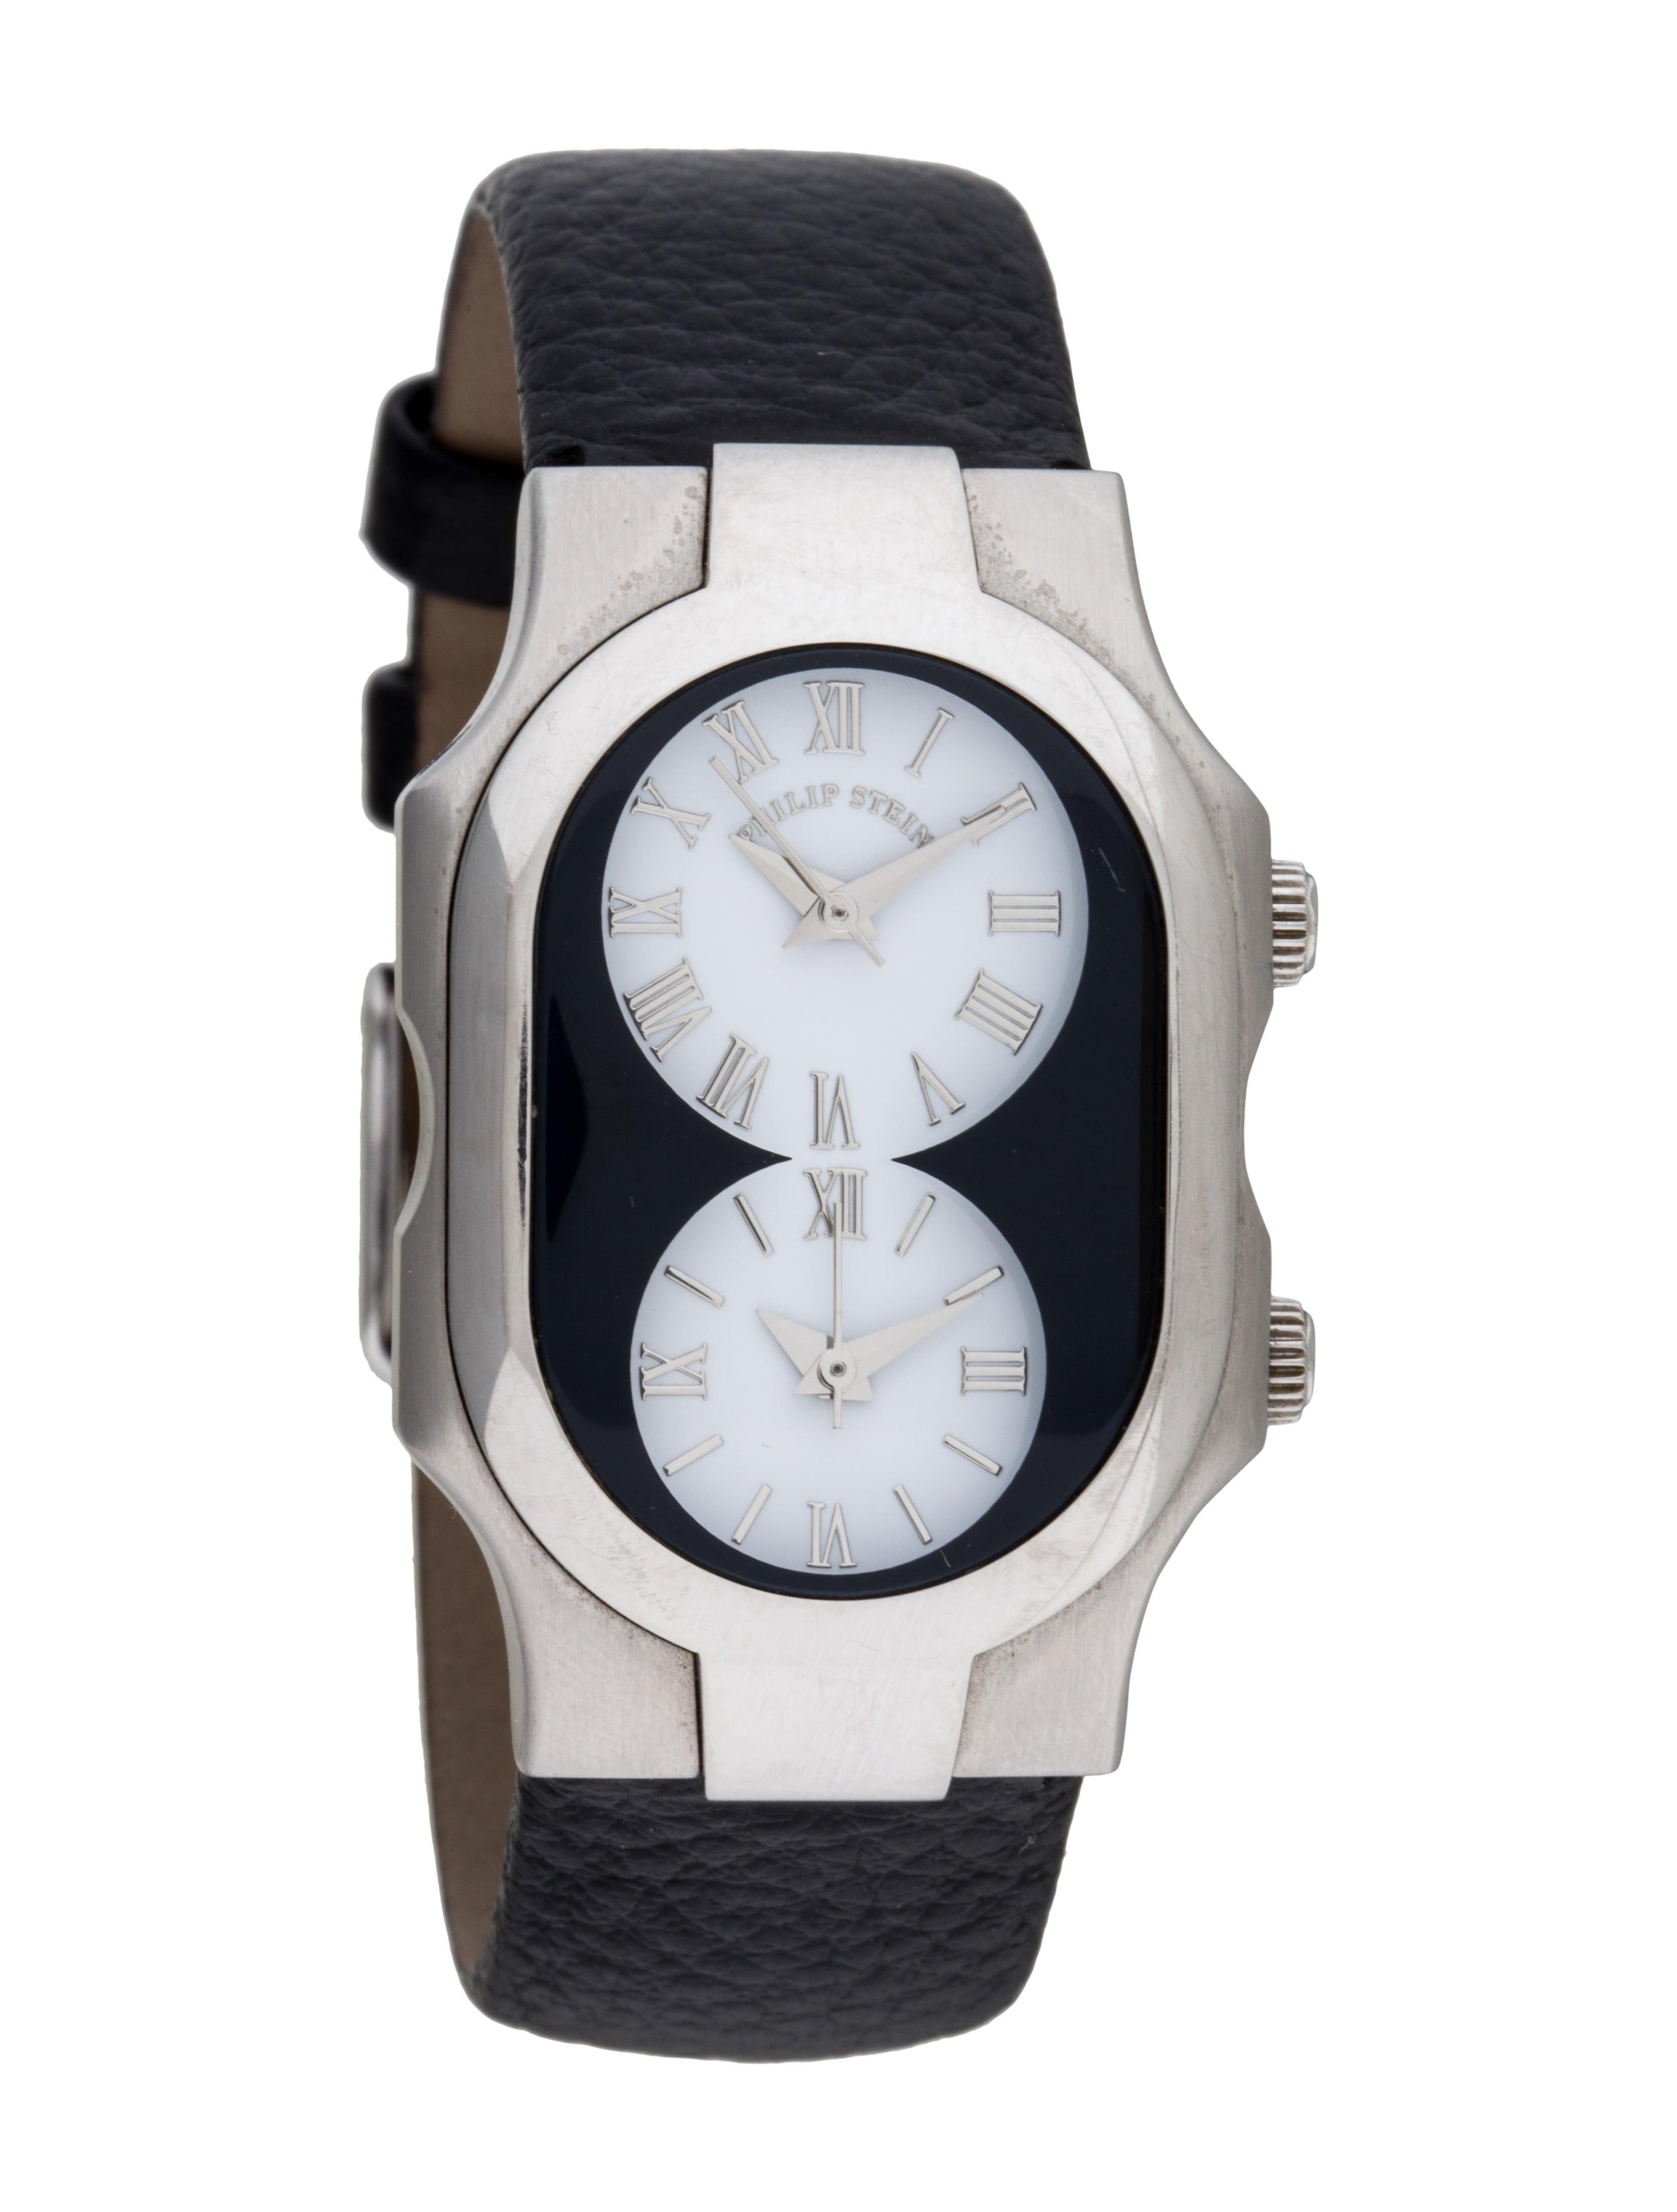 Philip stein signature watch strap phs20348 the realreal for Philip stein watches